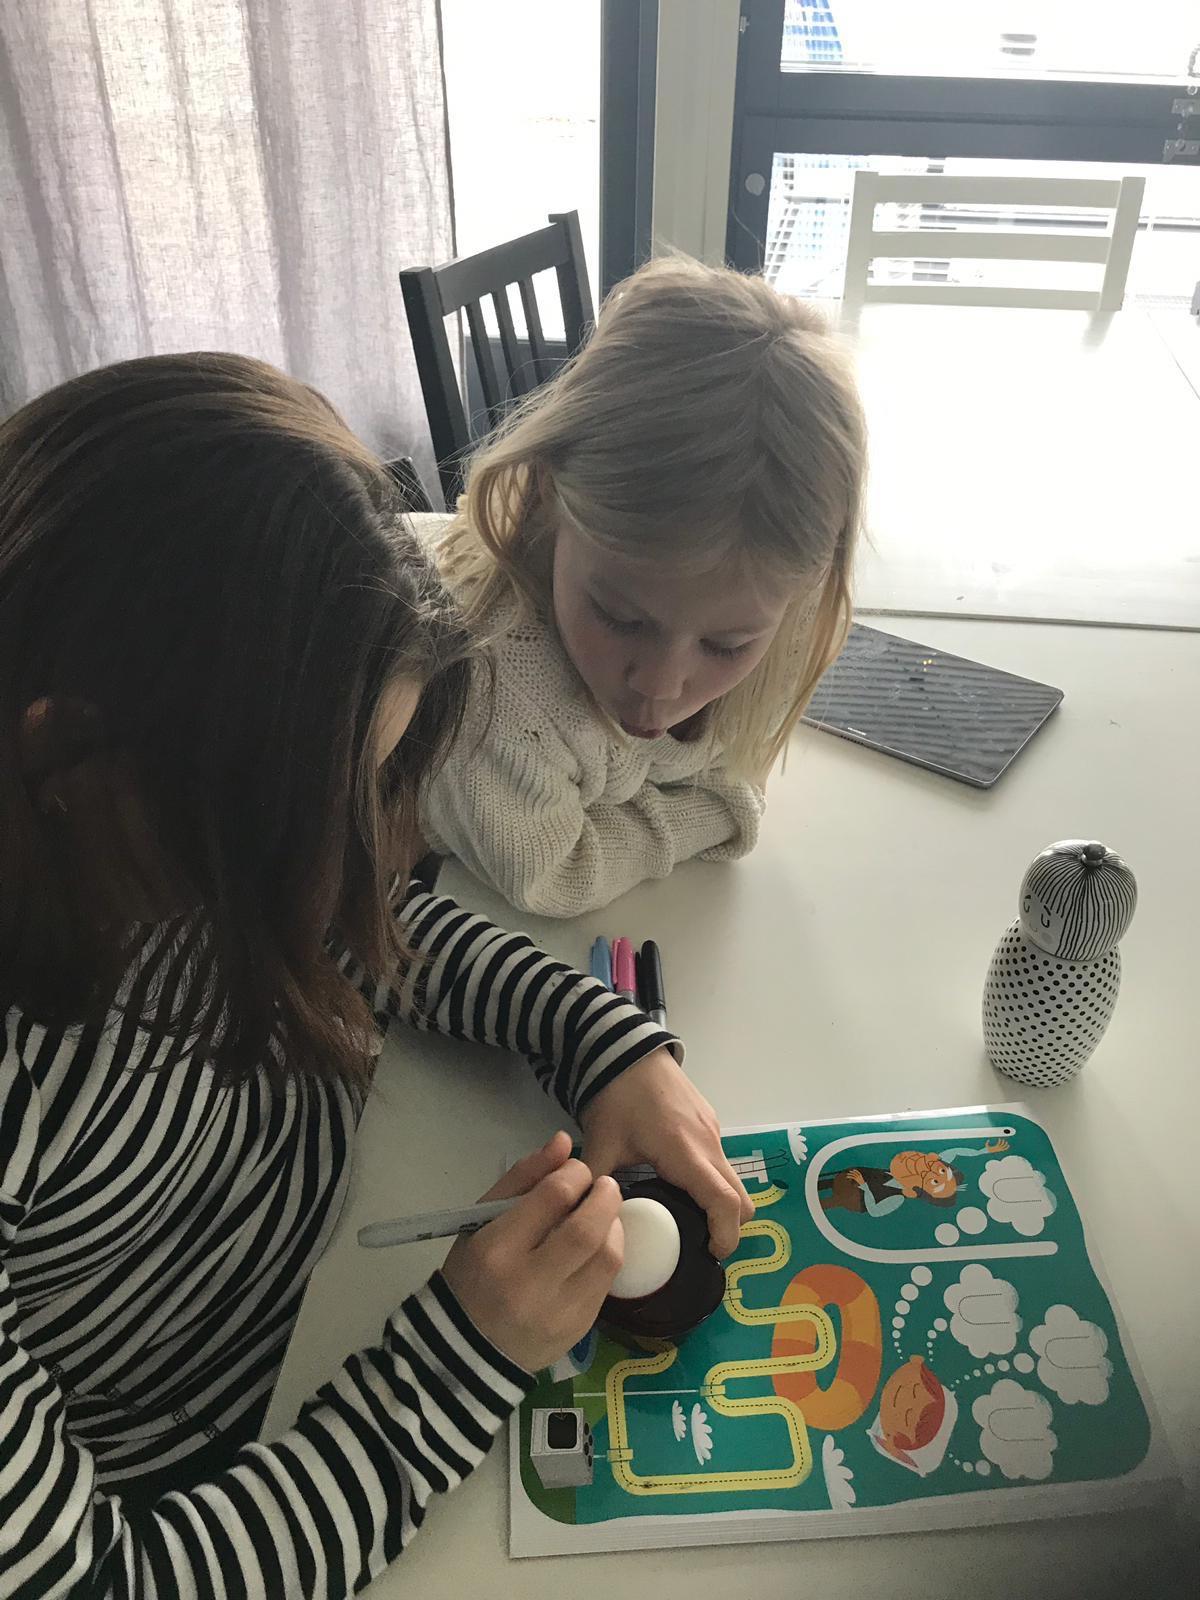 Storyoftenblog